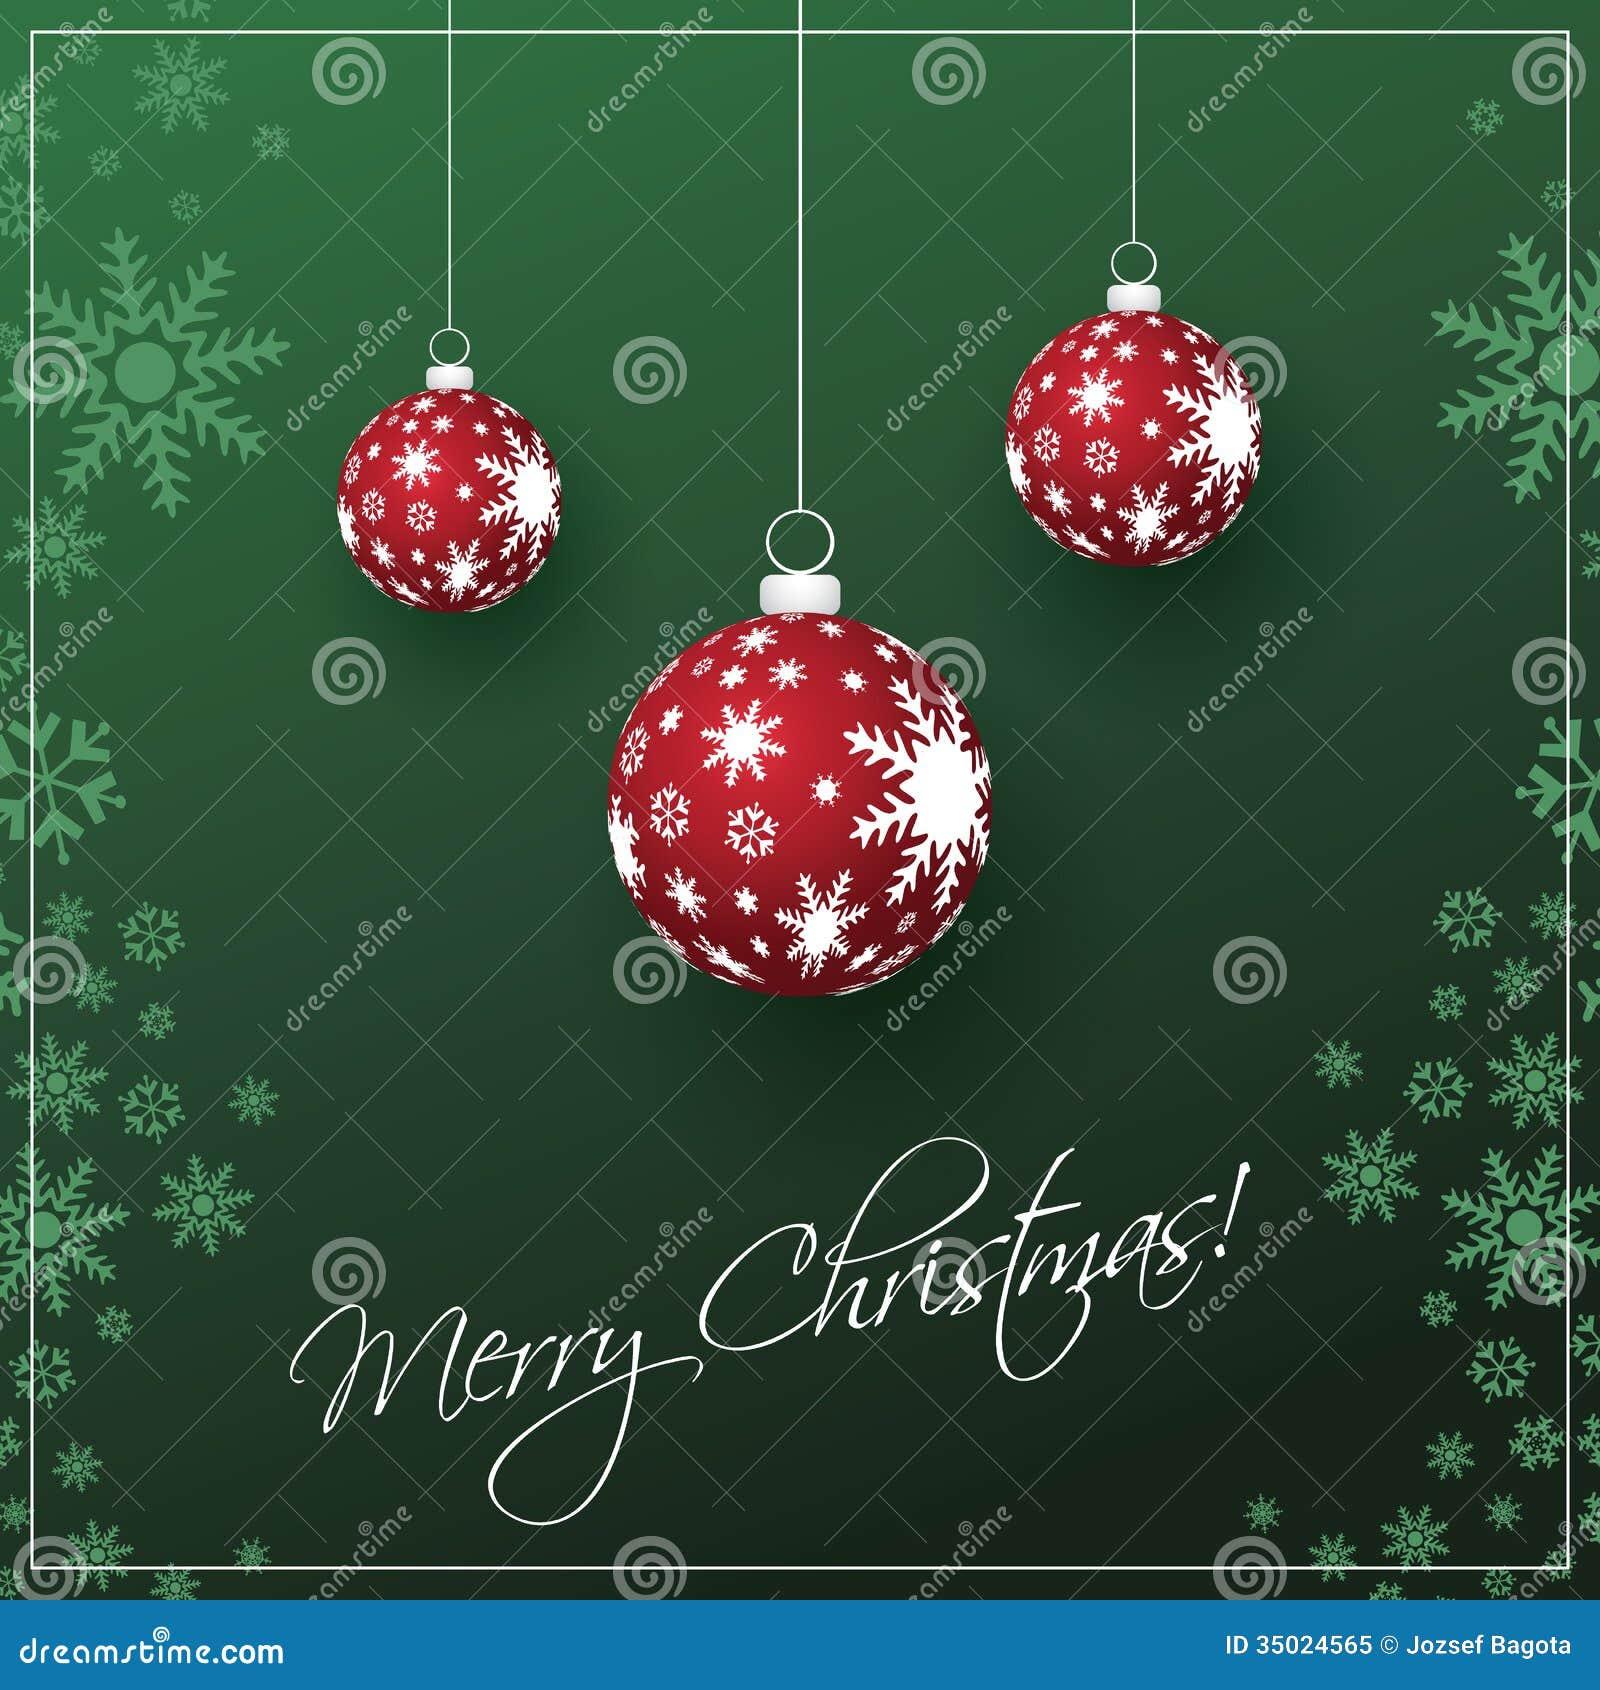 Christmas Card Background Royalty Free Stock Photo - Image: 35024565